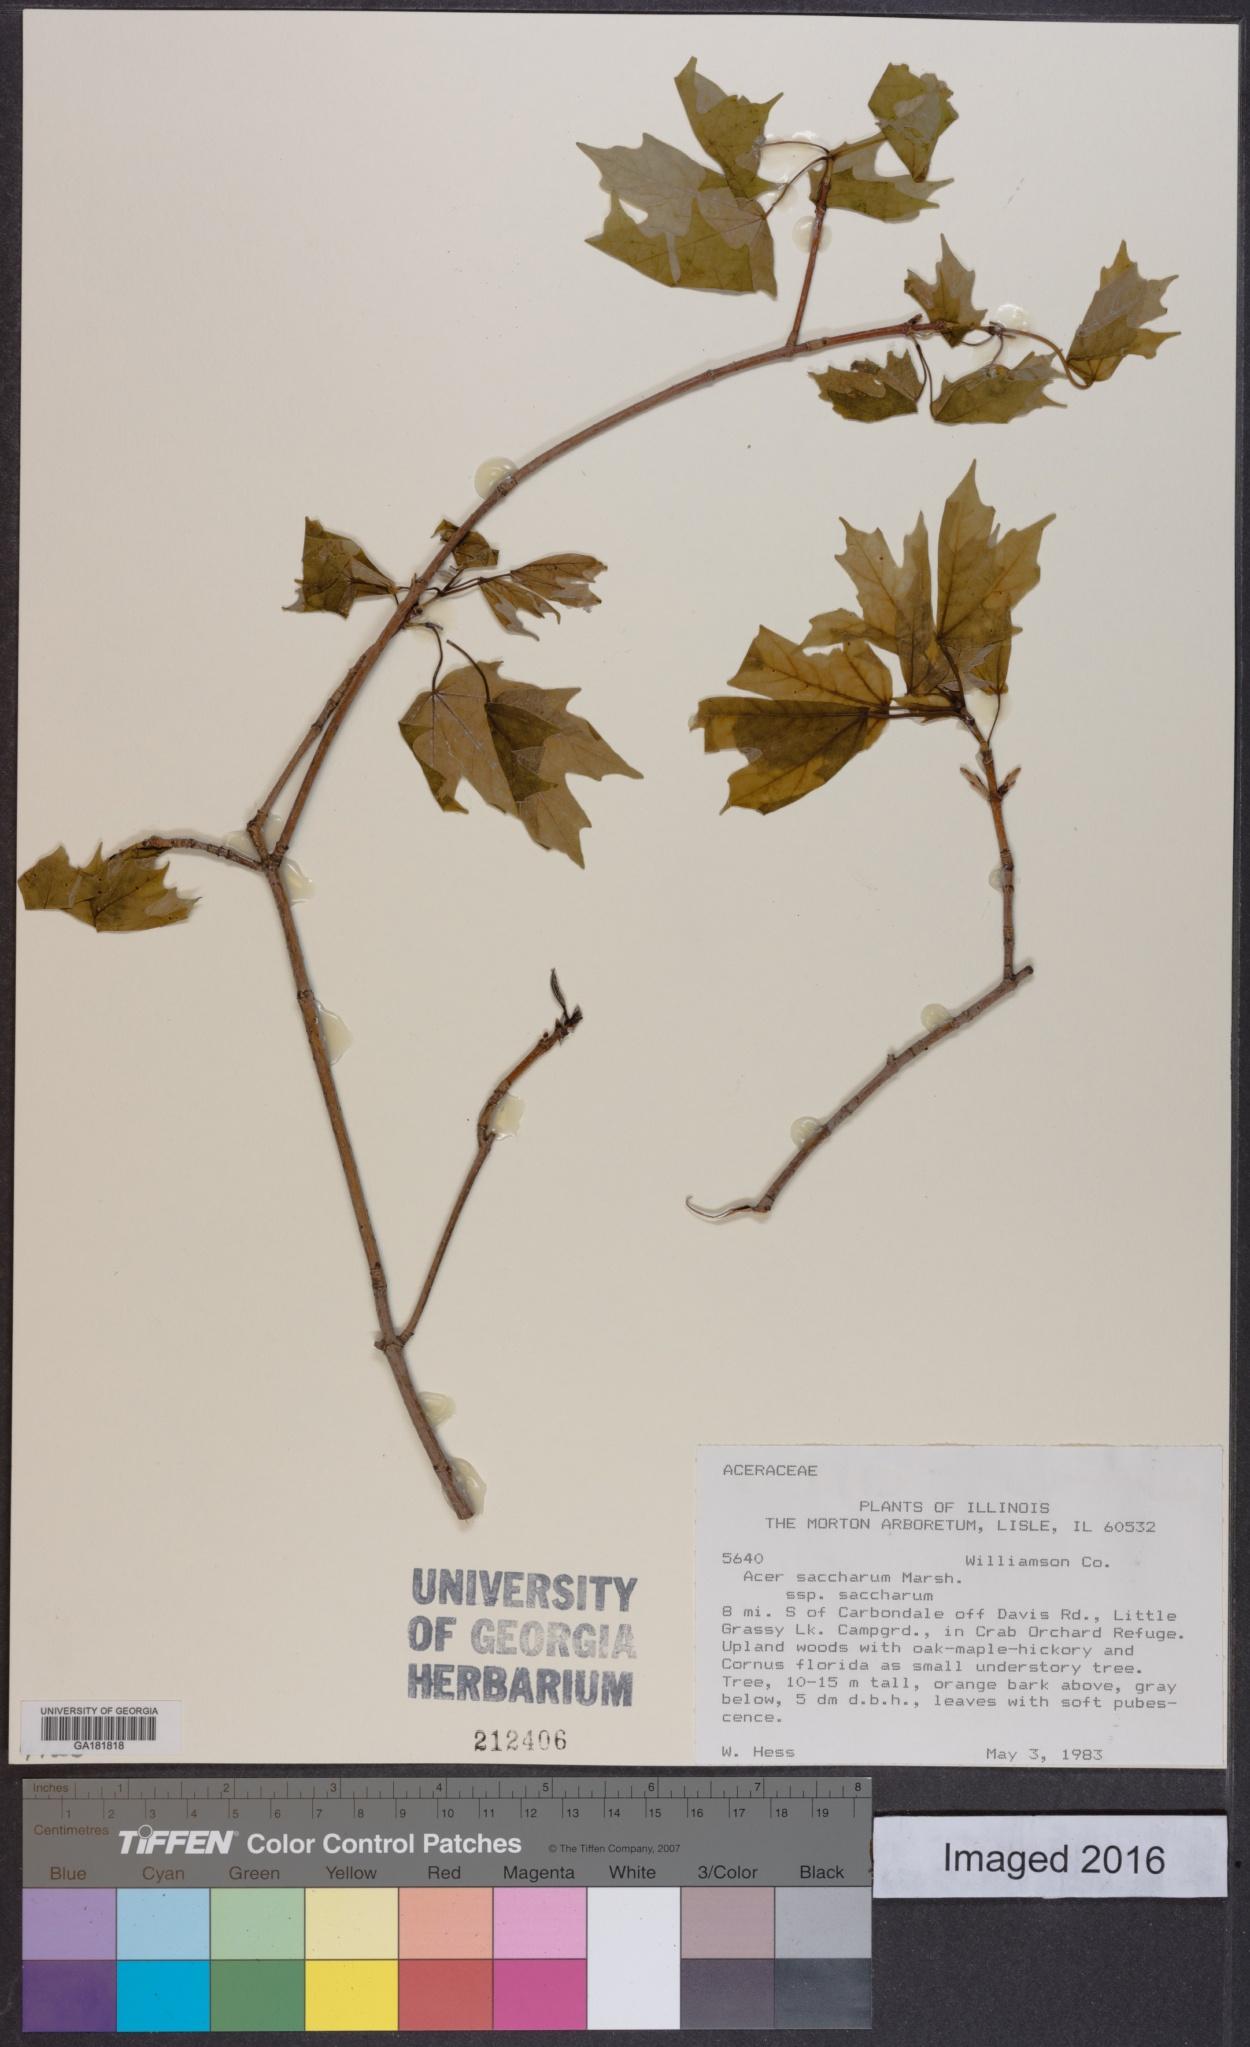 Acer saccharum subsp. saccharum image